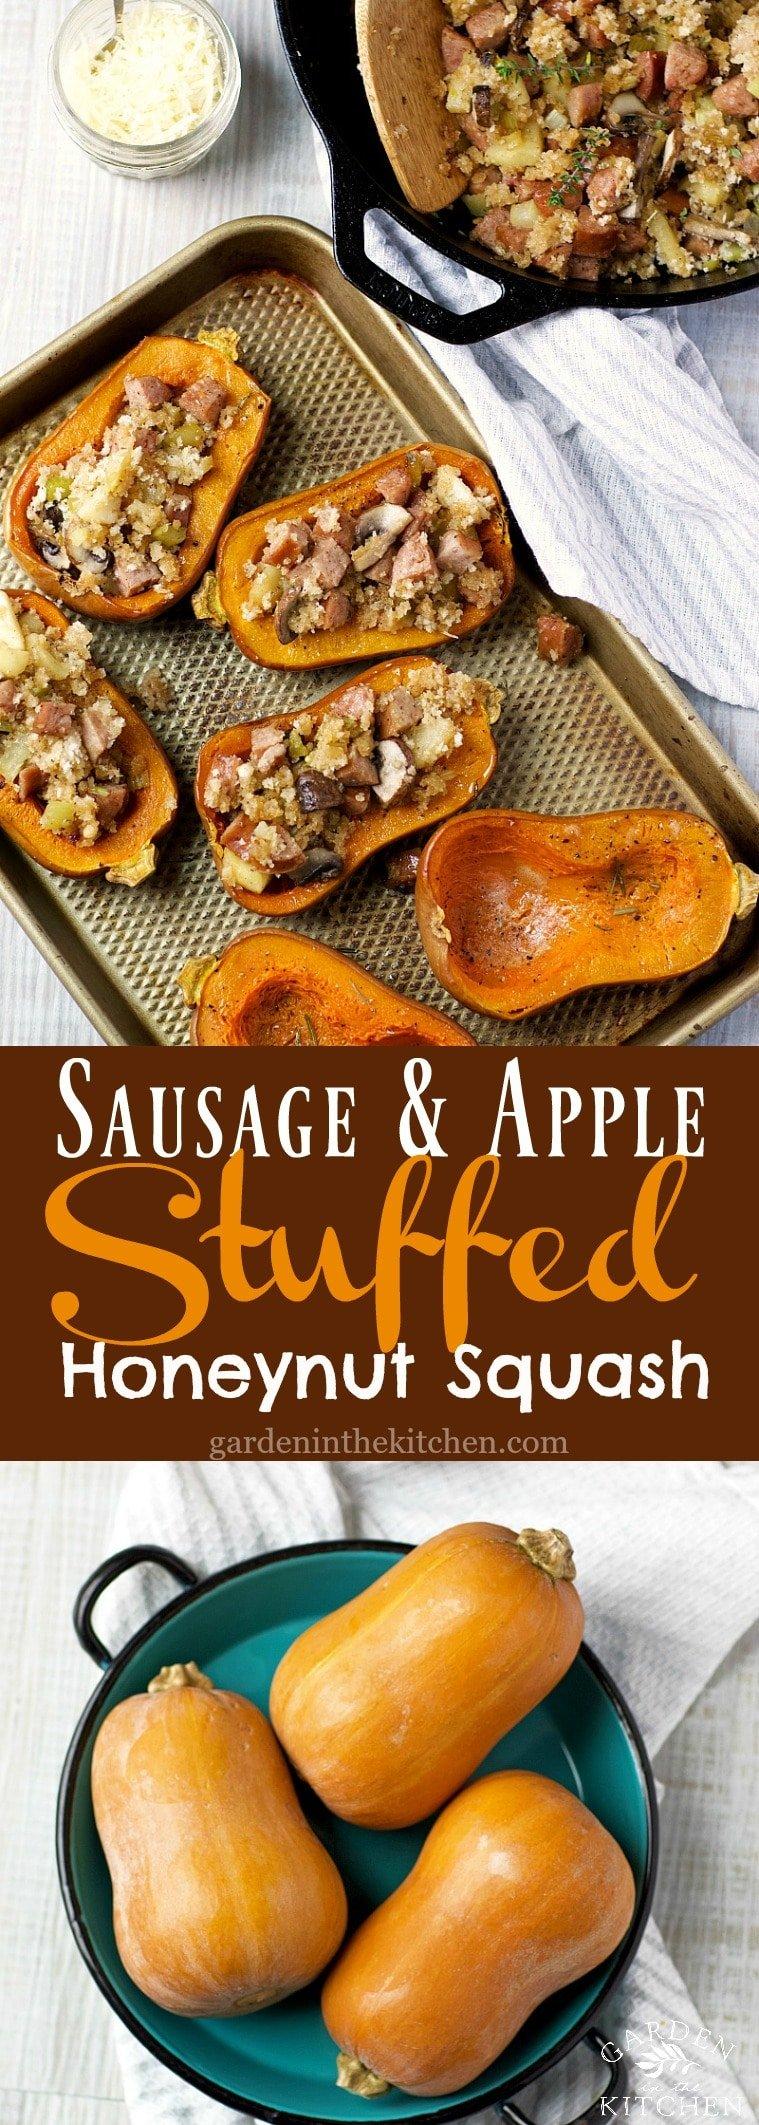 Sausage & Apple Stuffed Honeynut Squash